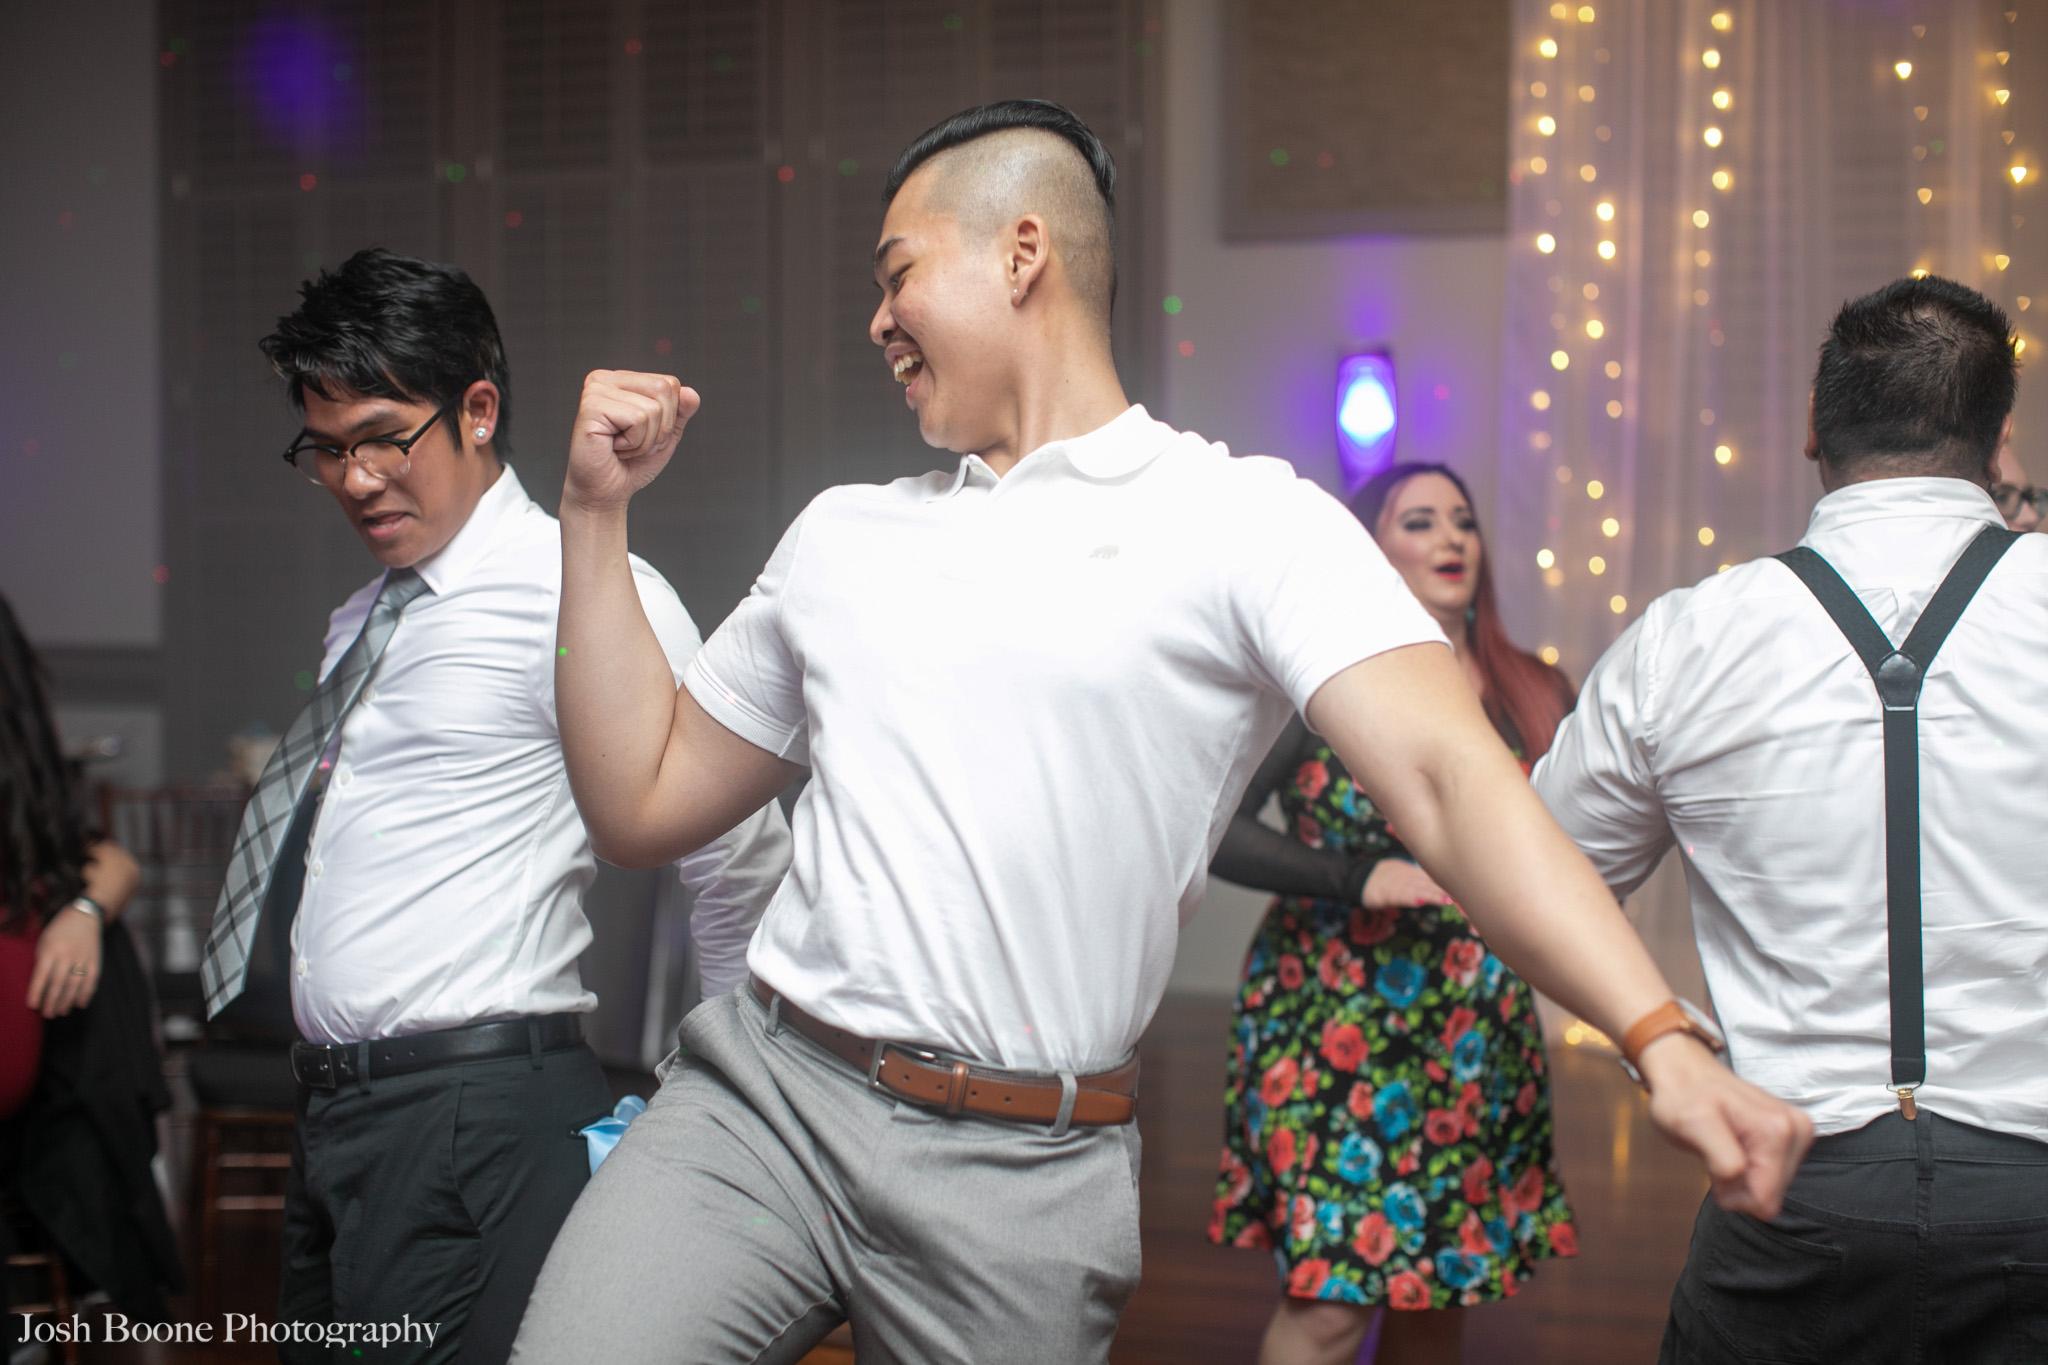 noahs_event_venue_wedding-99.jpg